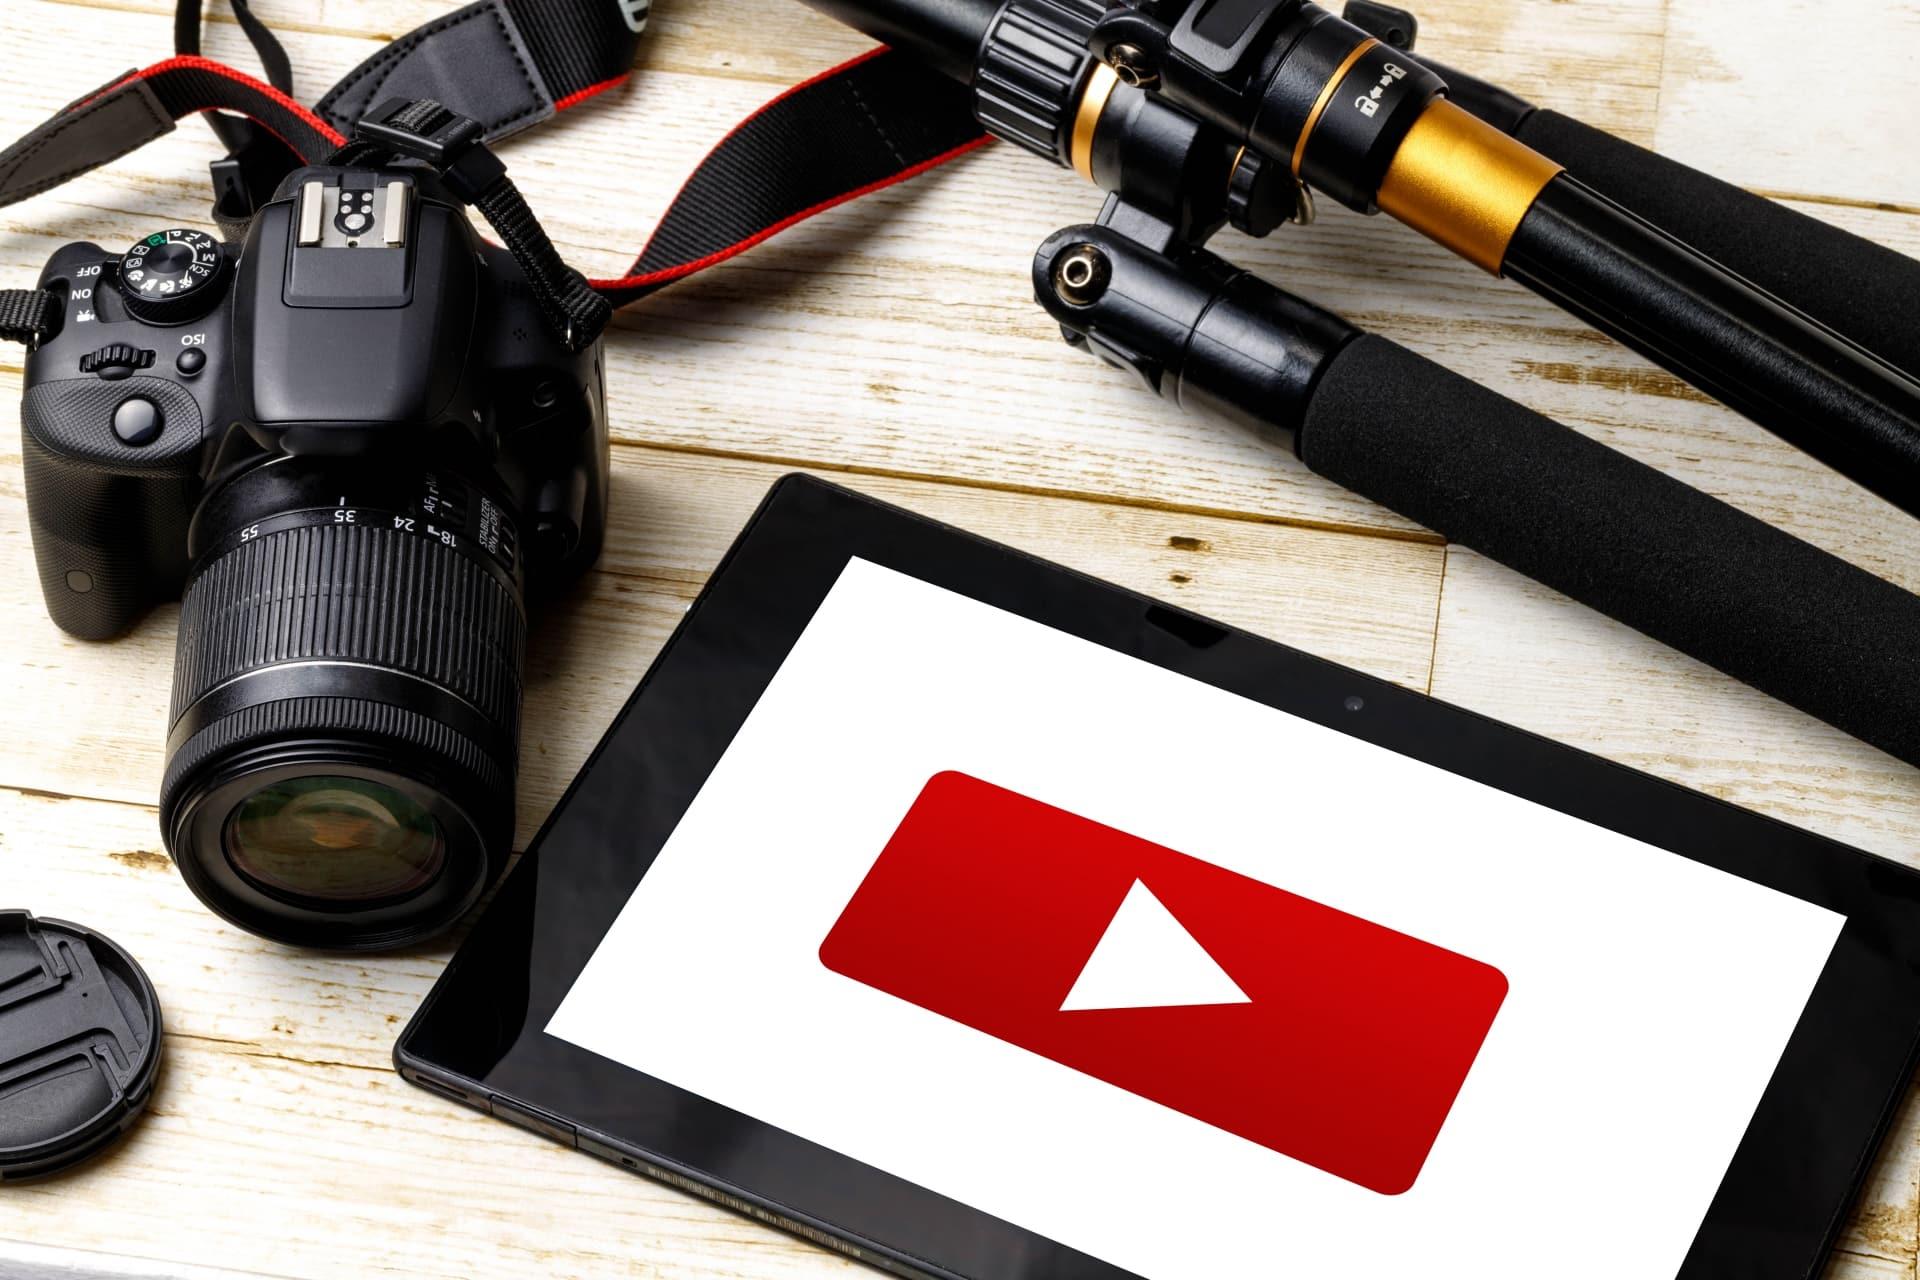 YouTubeの動画編集に役立つおすすめアプリ9選と使い方まとめ